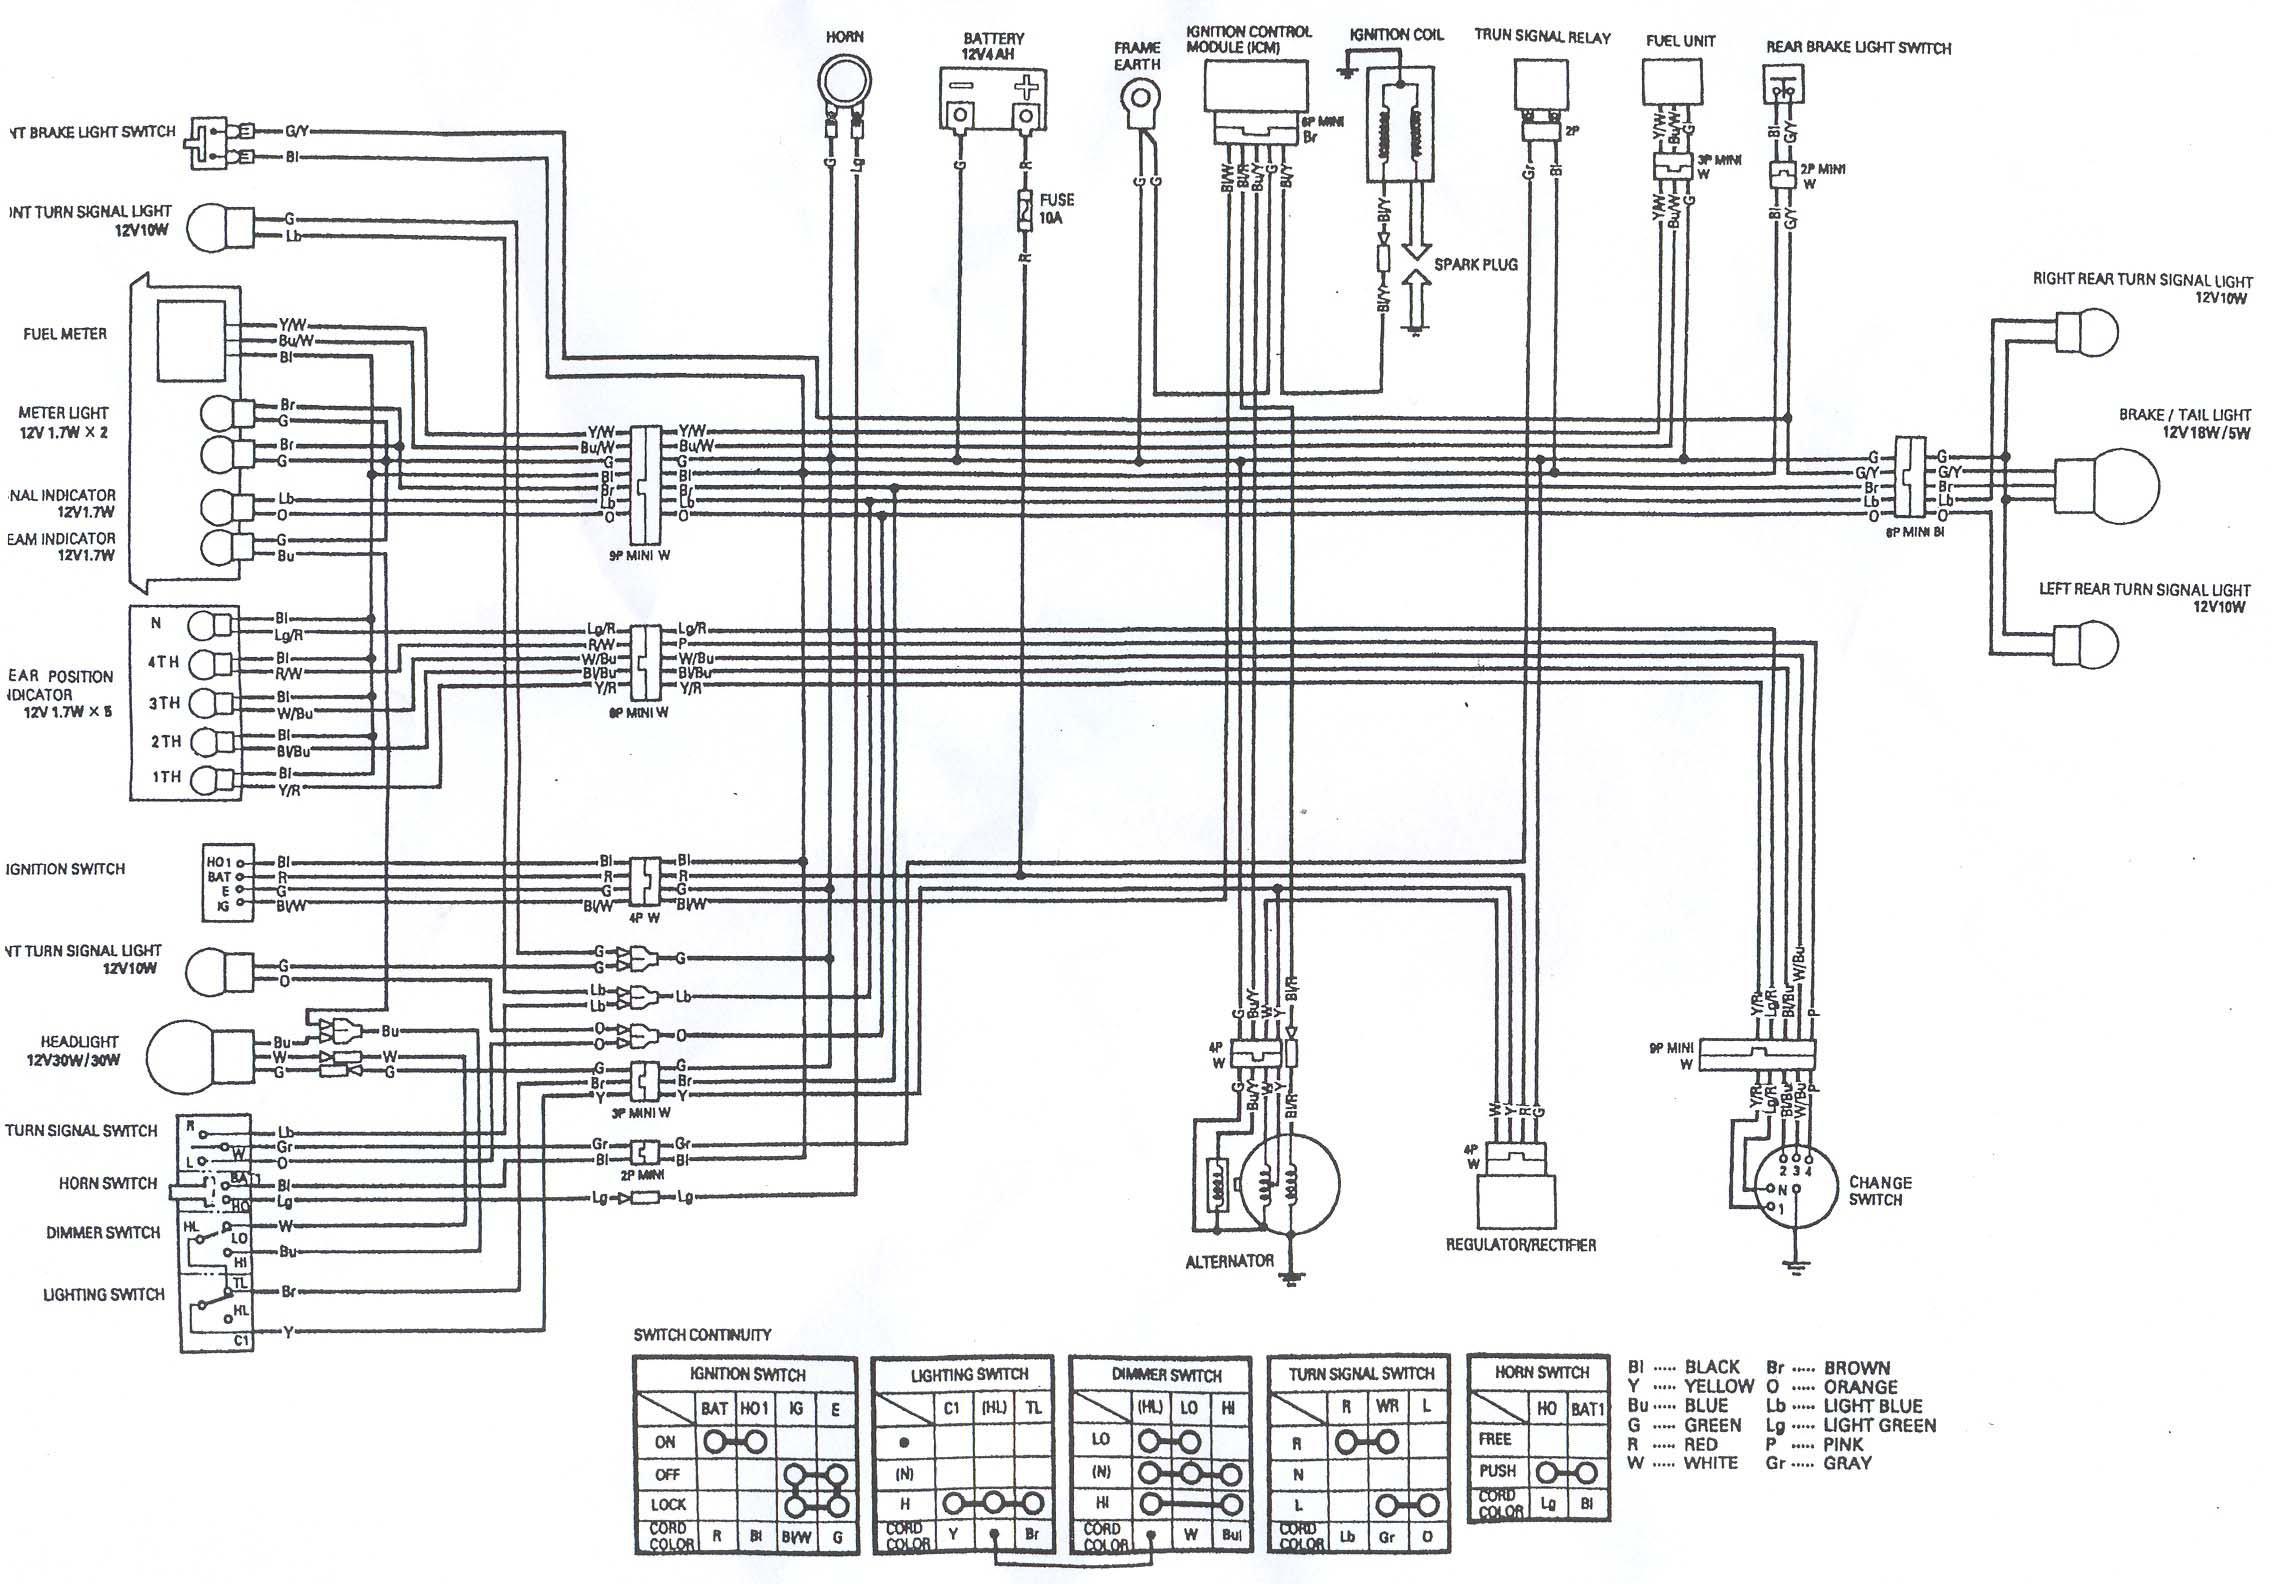 panther 110 atv wiring diagram diagram auto wiring diagram 110Cc 4 Wheeler Wiring Diagram Need a Picture of a 110 ATV Wiring Diagram